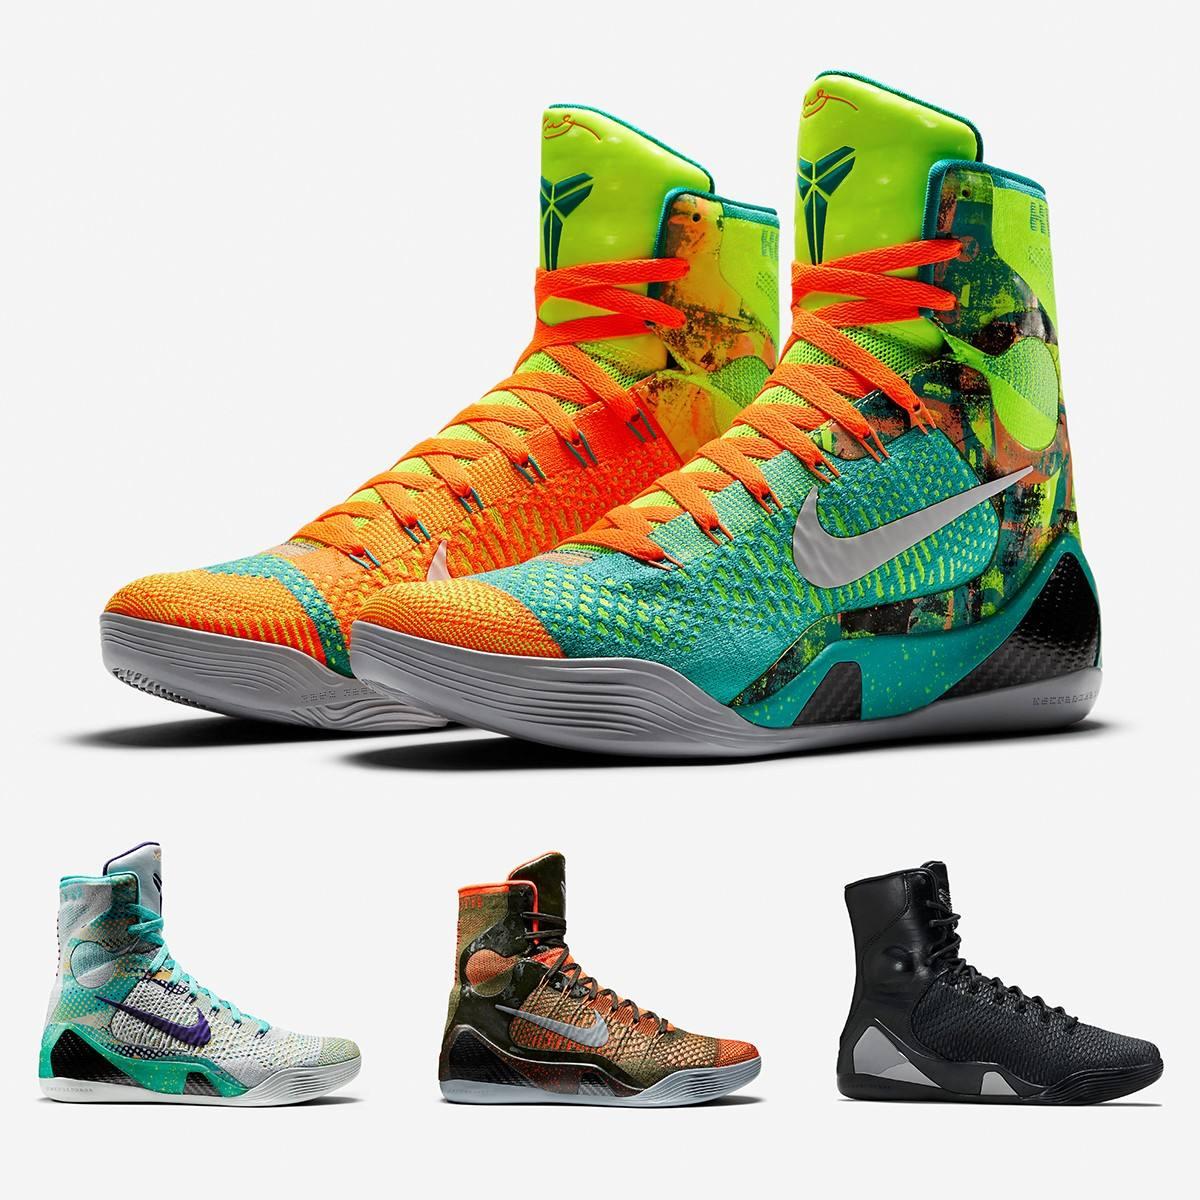 Nike Kobe hombre